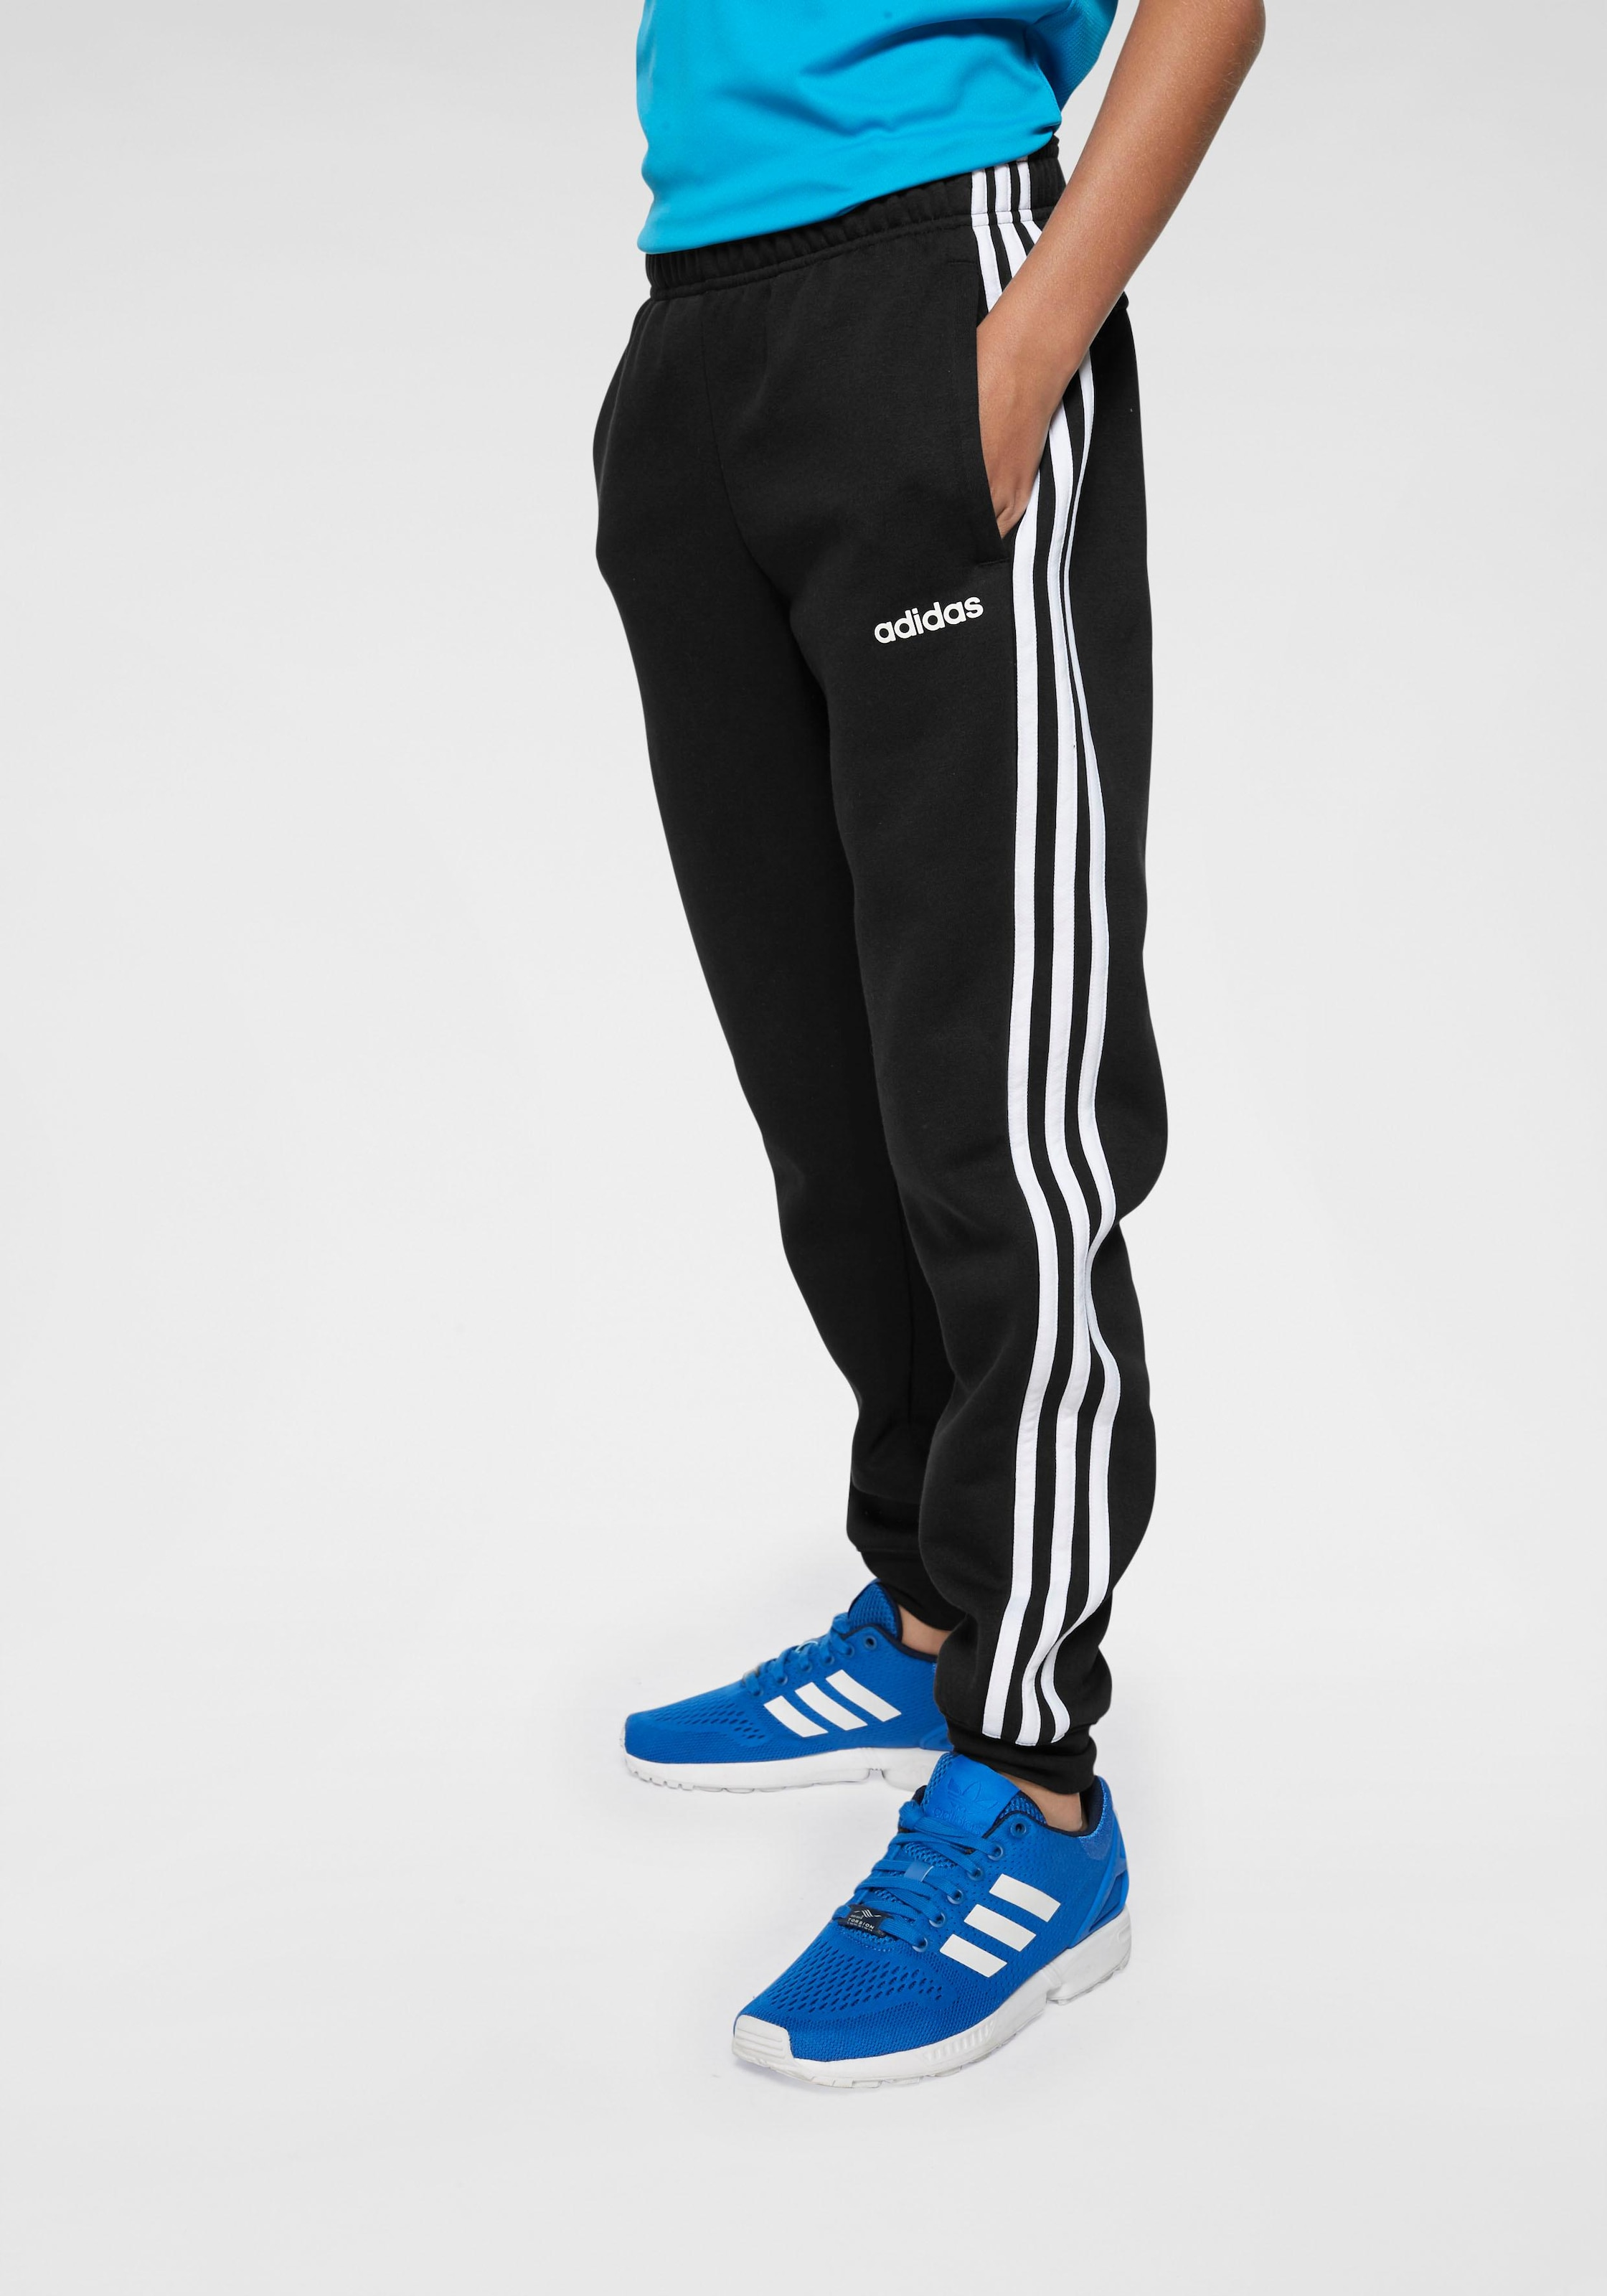 jogginghose adidas polyester